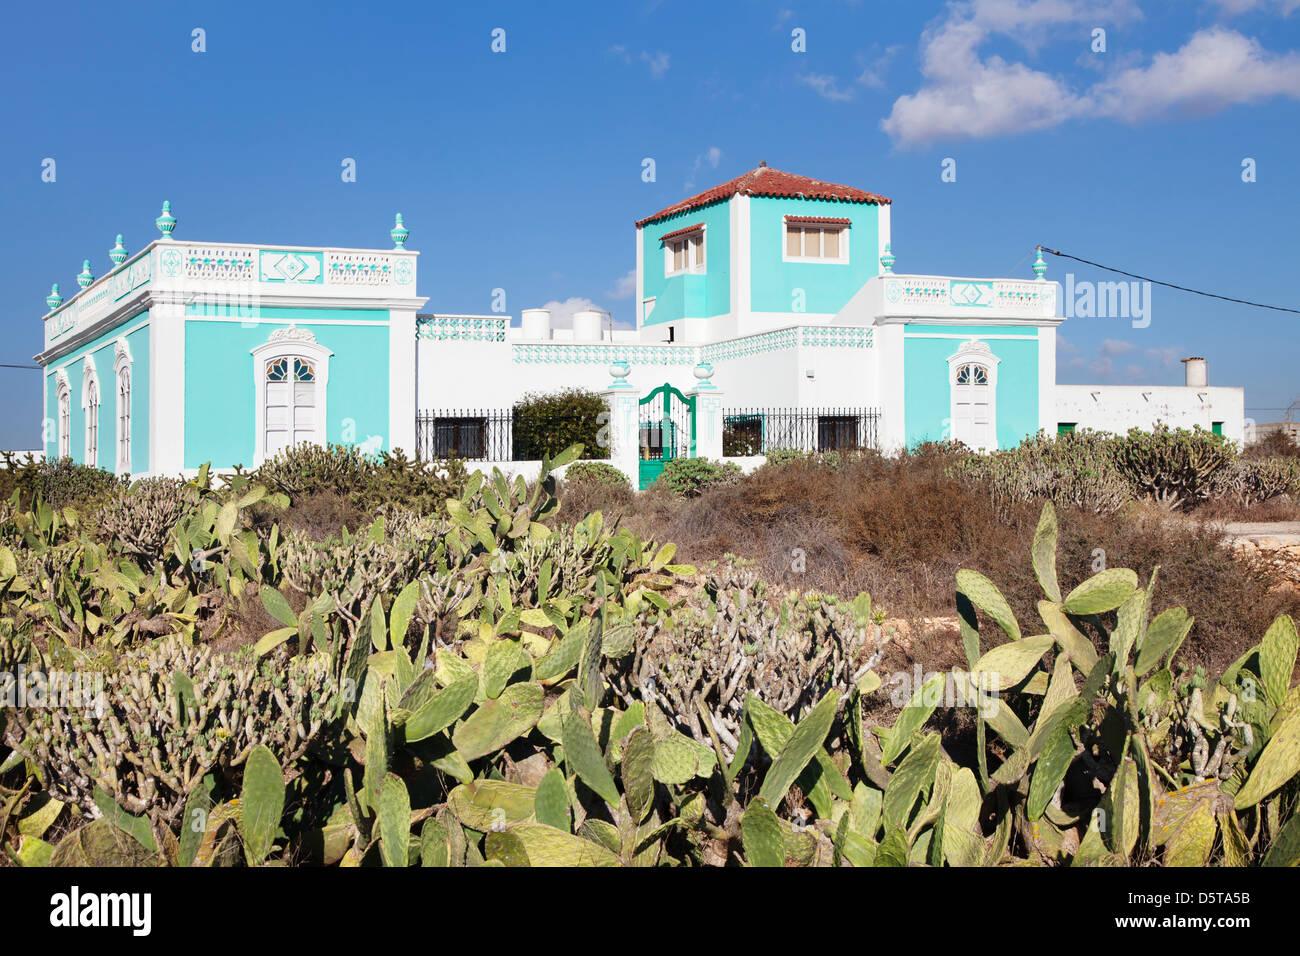 Villa Inmitten von Kakteen, Antigua, Fuerteventura, Kanarische Inseln, Spanien Stockbild